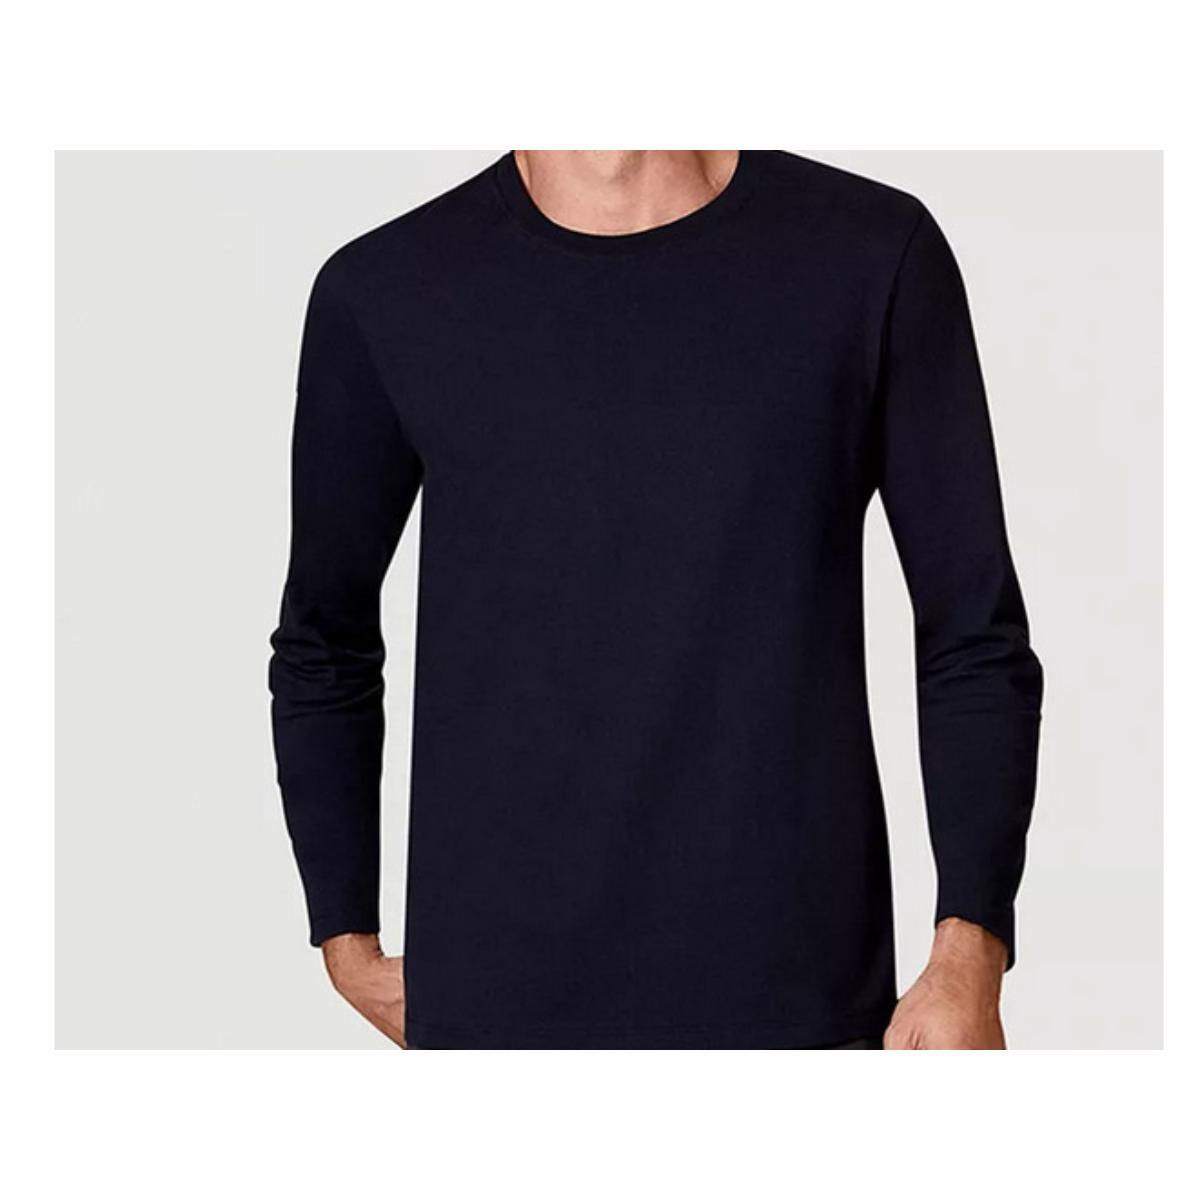 Camiseta Masculina Hering 026x Ax7en Marinho